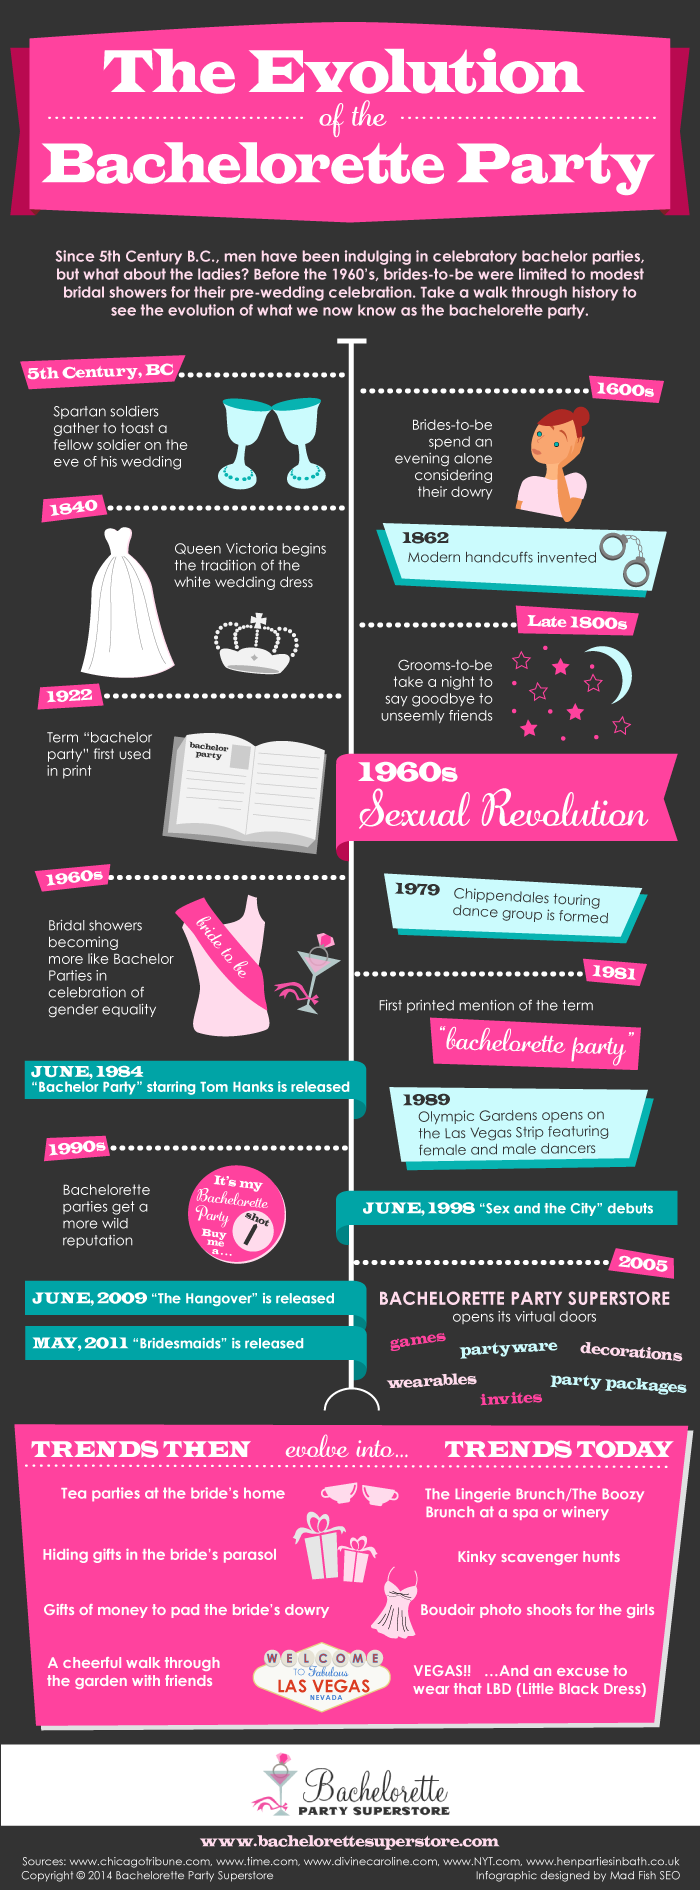 bachelorette party history